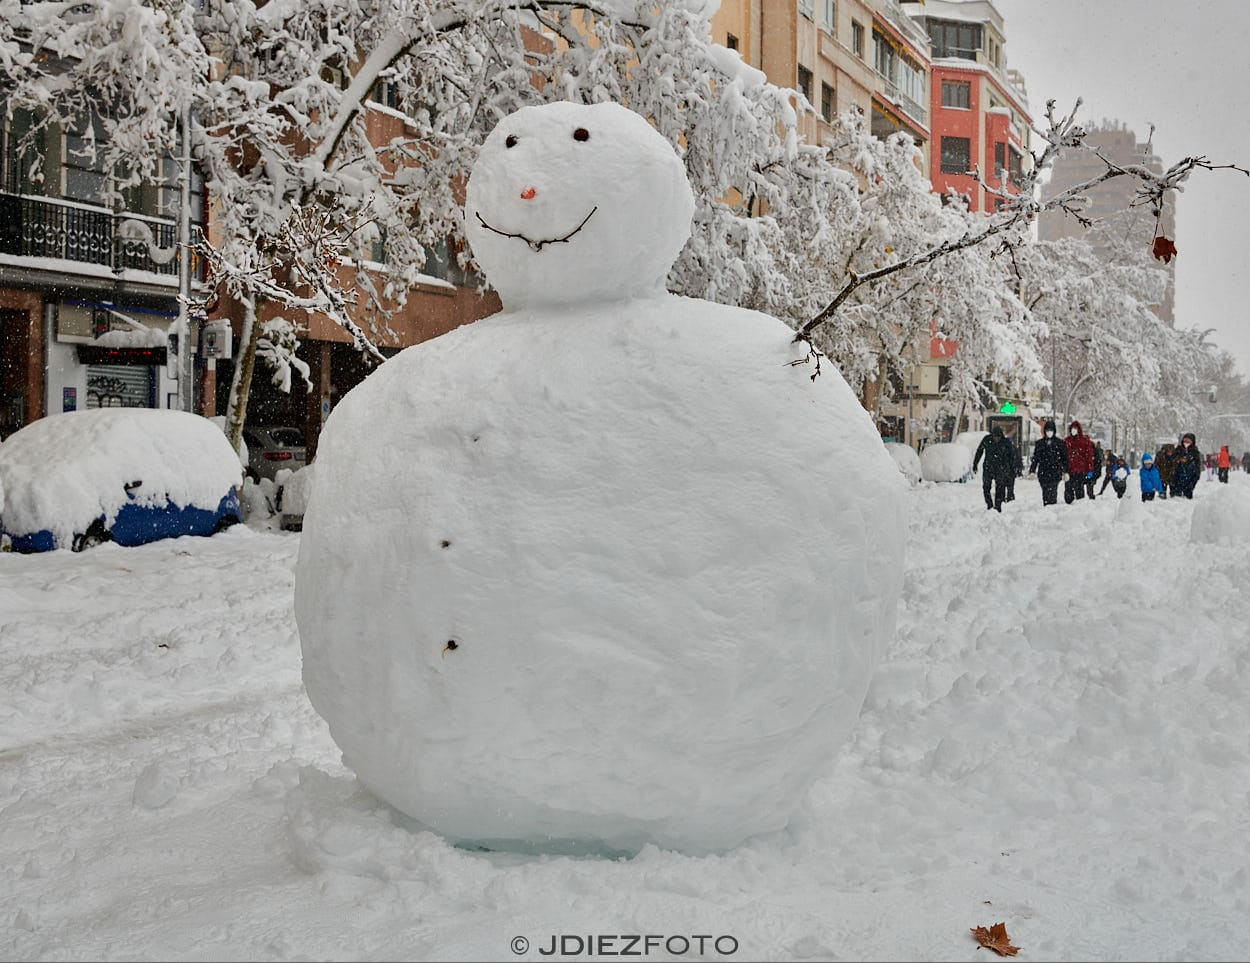 Arte en la nieve de Madrid